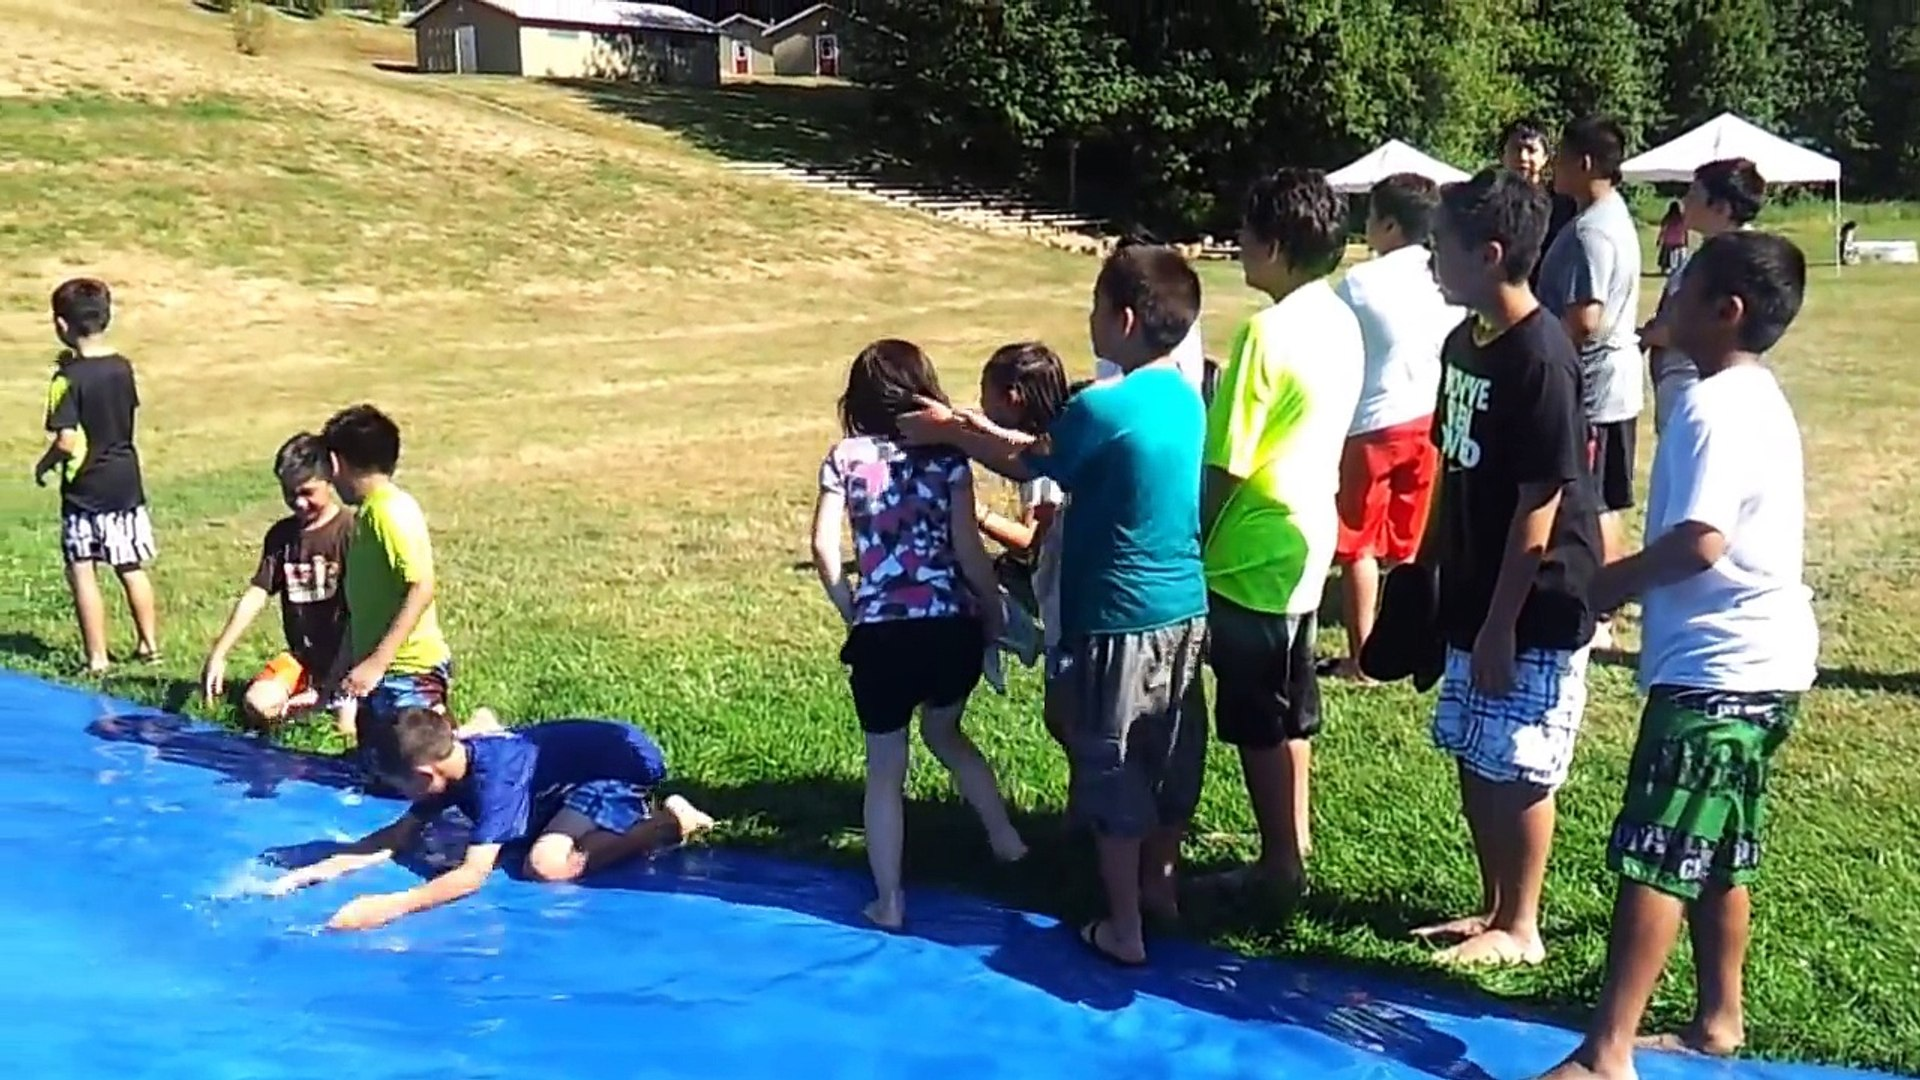 NorthWest Kids Village - Slip n' Slide activity - YouTube